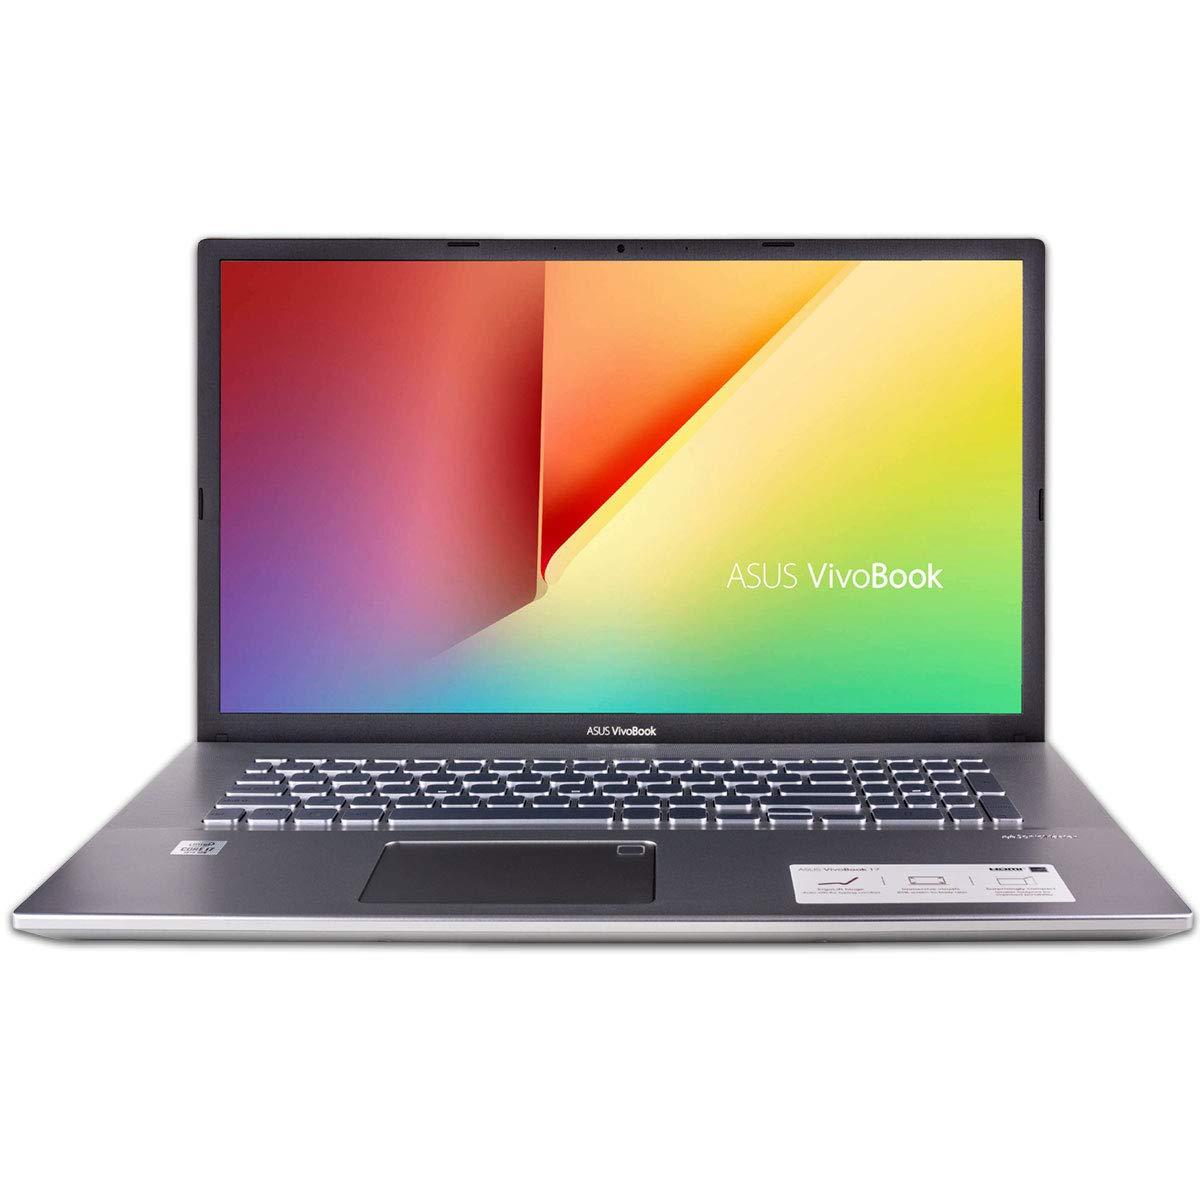 "CUK ASUS VivoBook S17 Thin and Light Laptop (Intel i7-10510U, 24GB RAM, 512GB NVMe SSD + 1TB HDD, 17.3"" Full HD, Windows 10 Home) Slim Compact Notebook Computer"